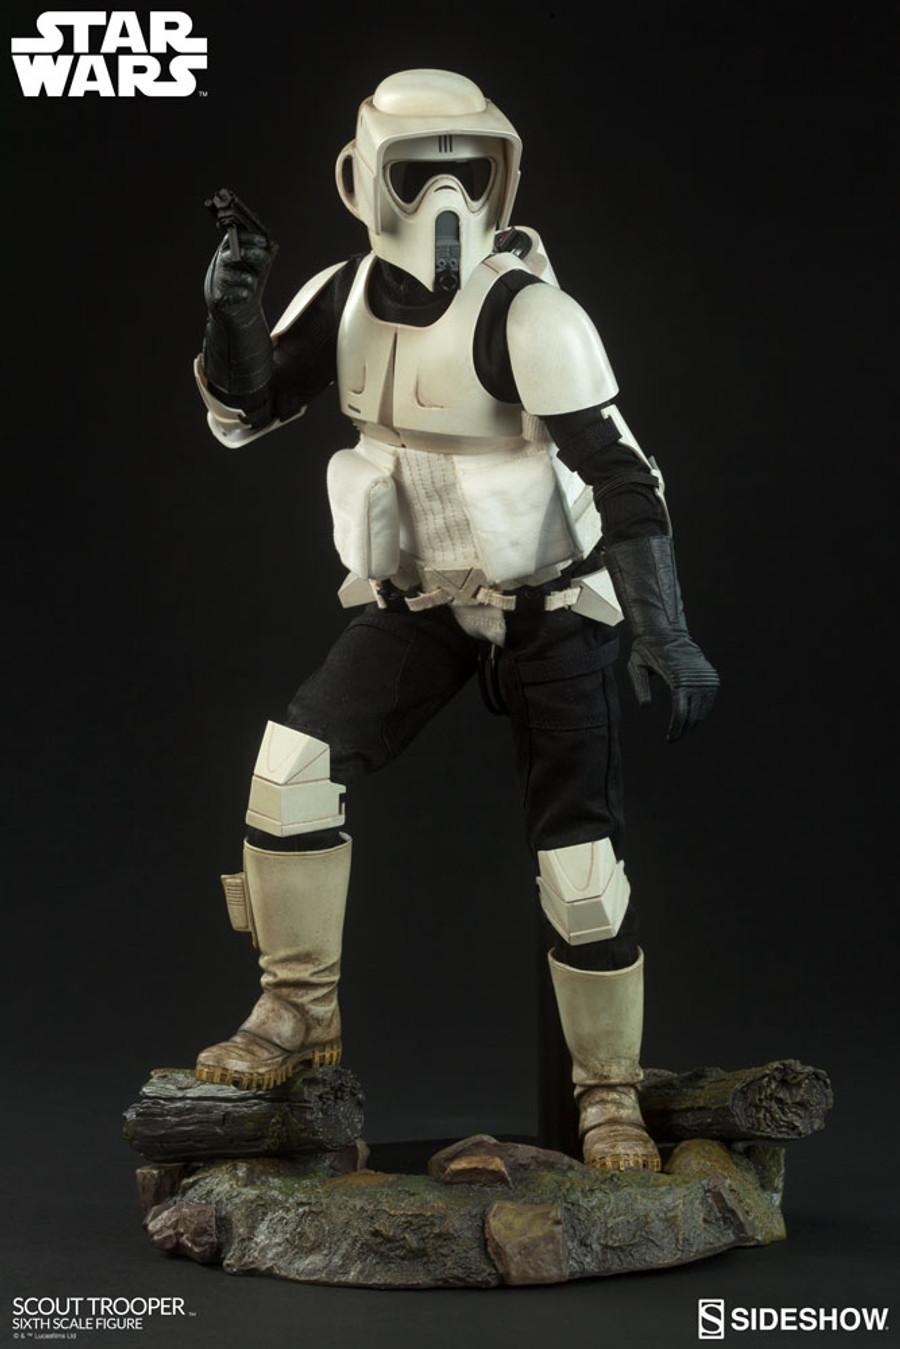 Sideshow - Star Wars Episode VI: Return of the Jedi - Scout Trooper